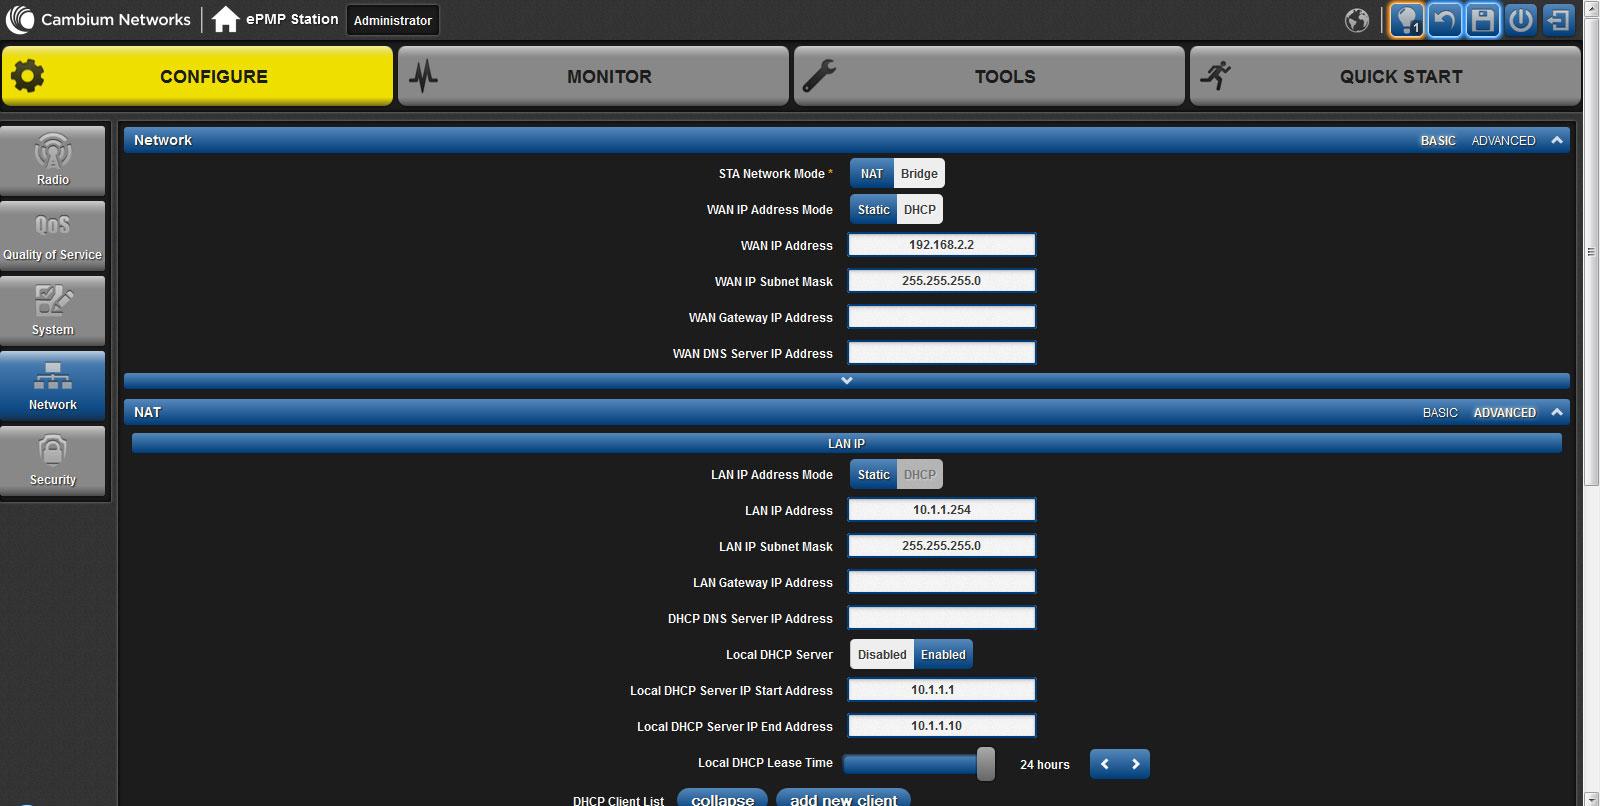 Настройки раздела Network web-интерфейса ePMP 1000 Integrated Radio